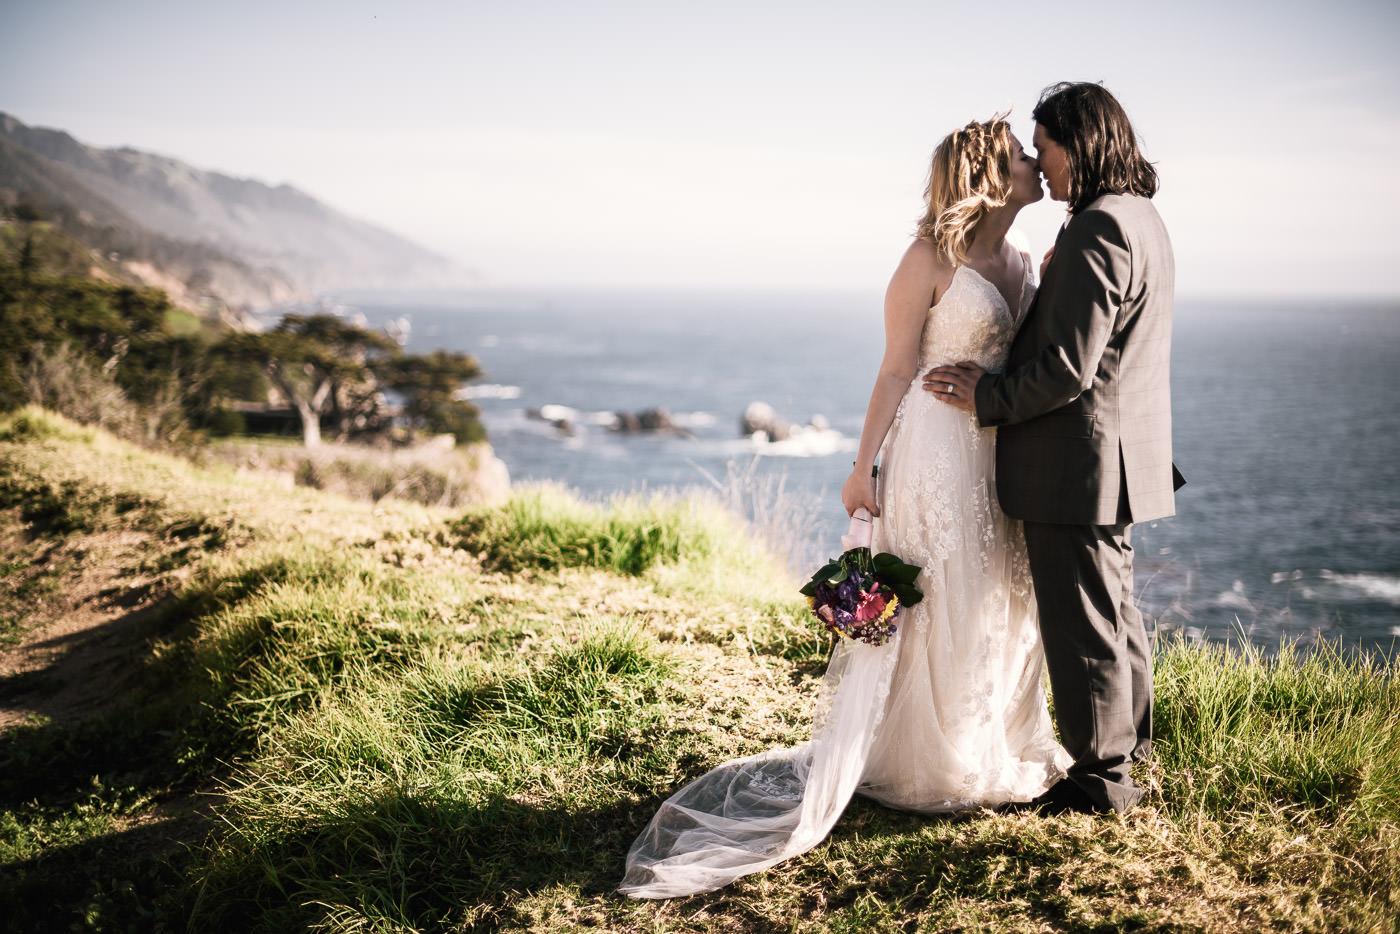 Wedding photographer near Big Sur California.